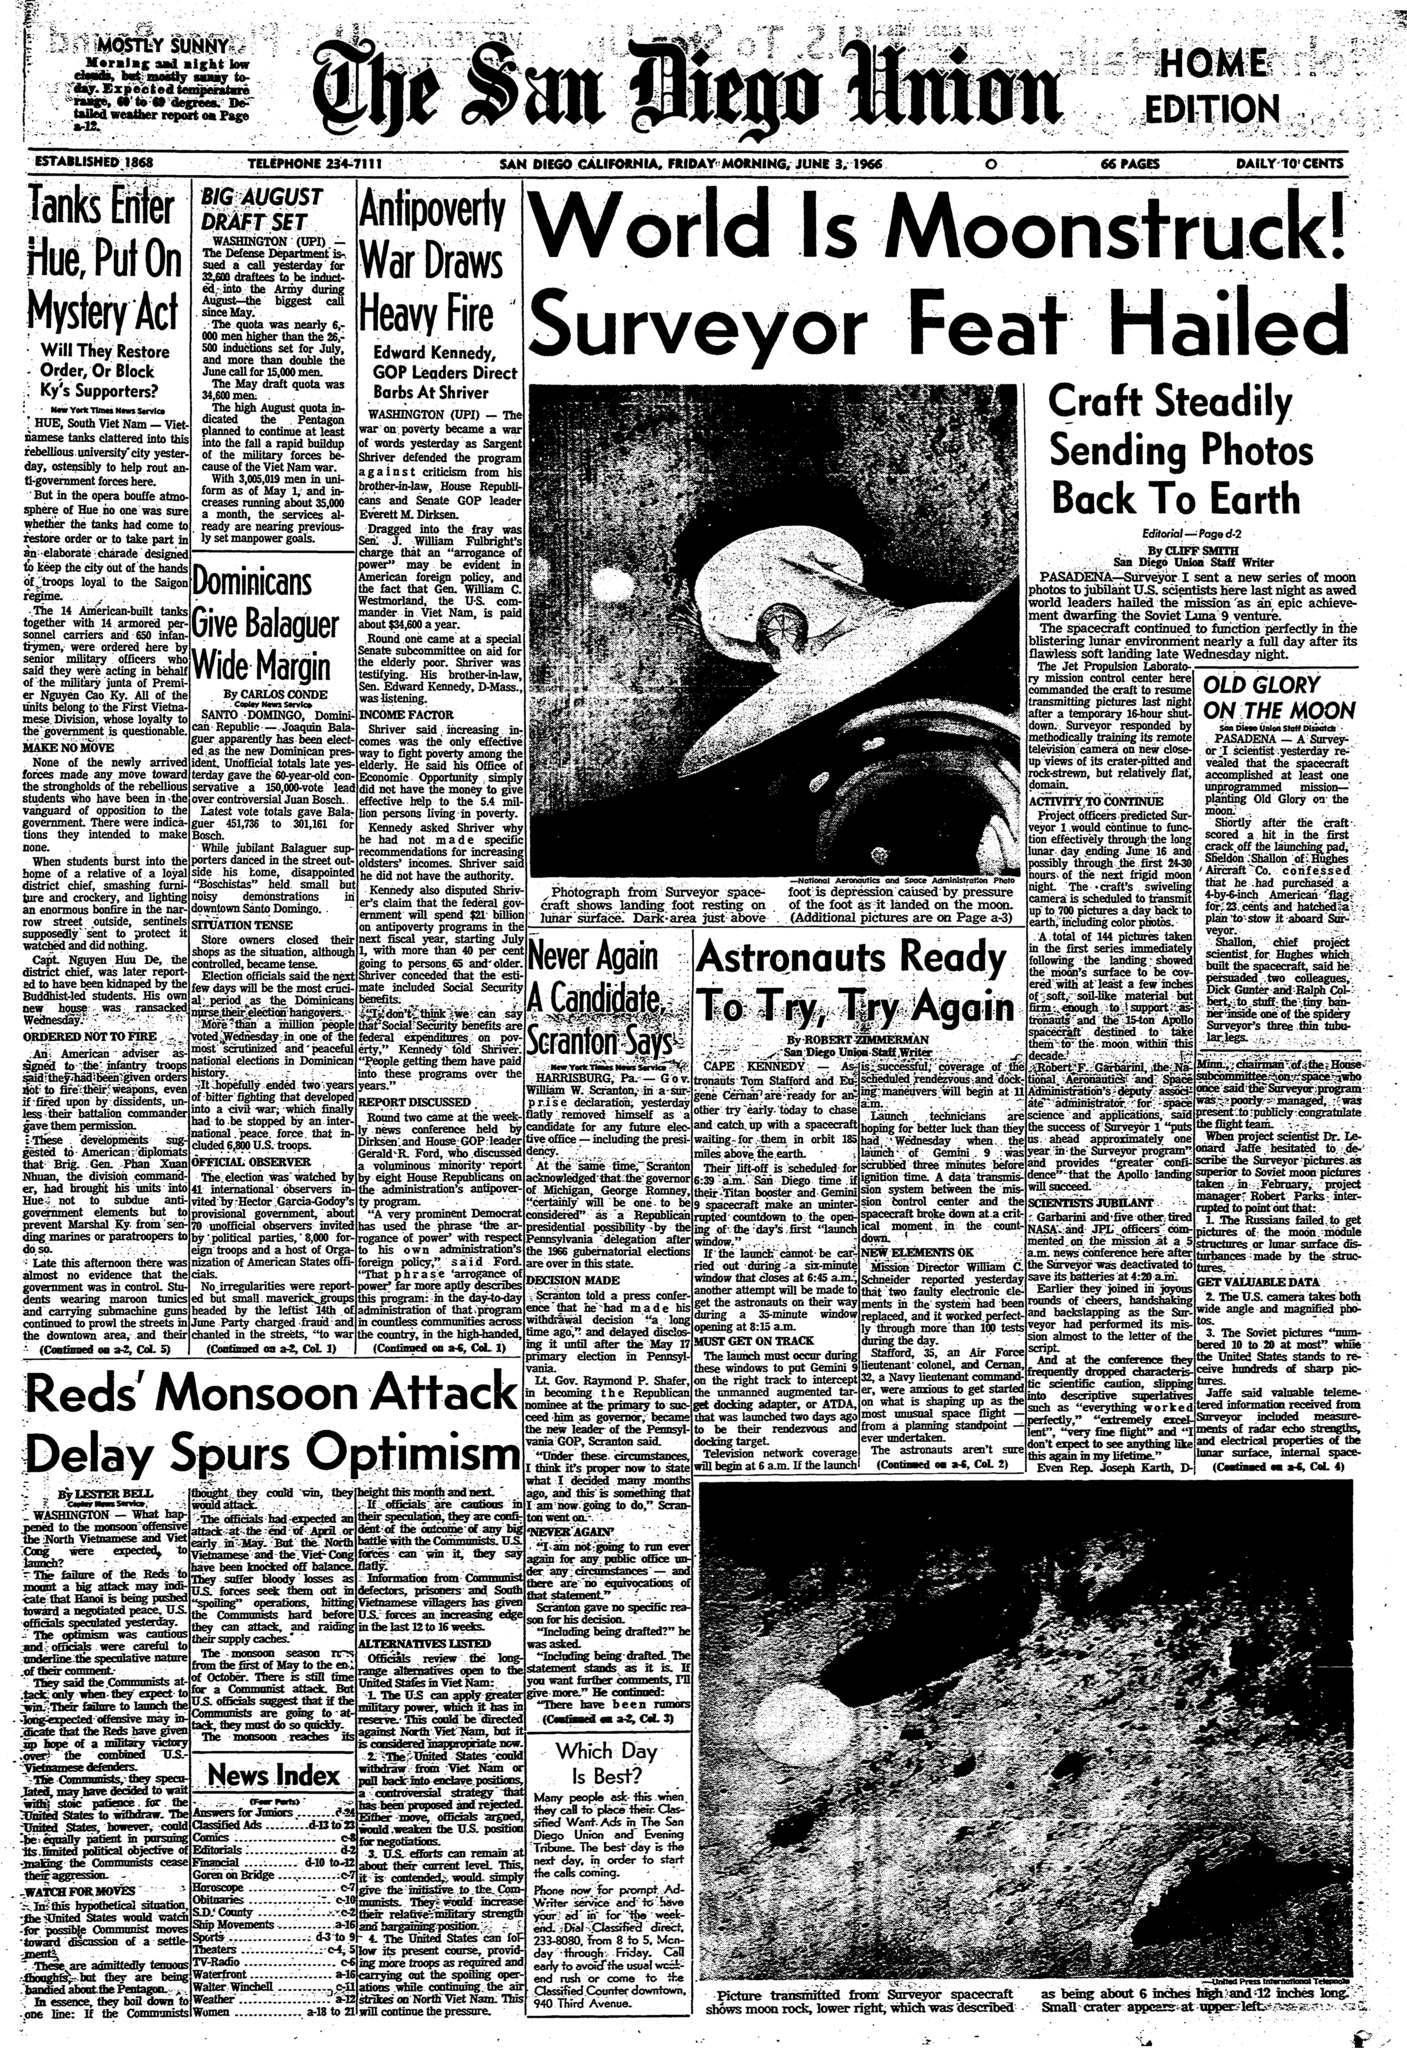 June 3, 1966